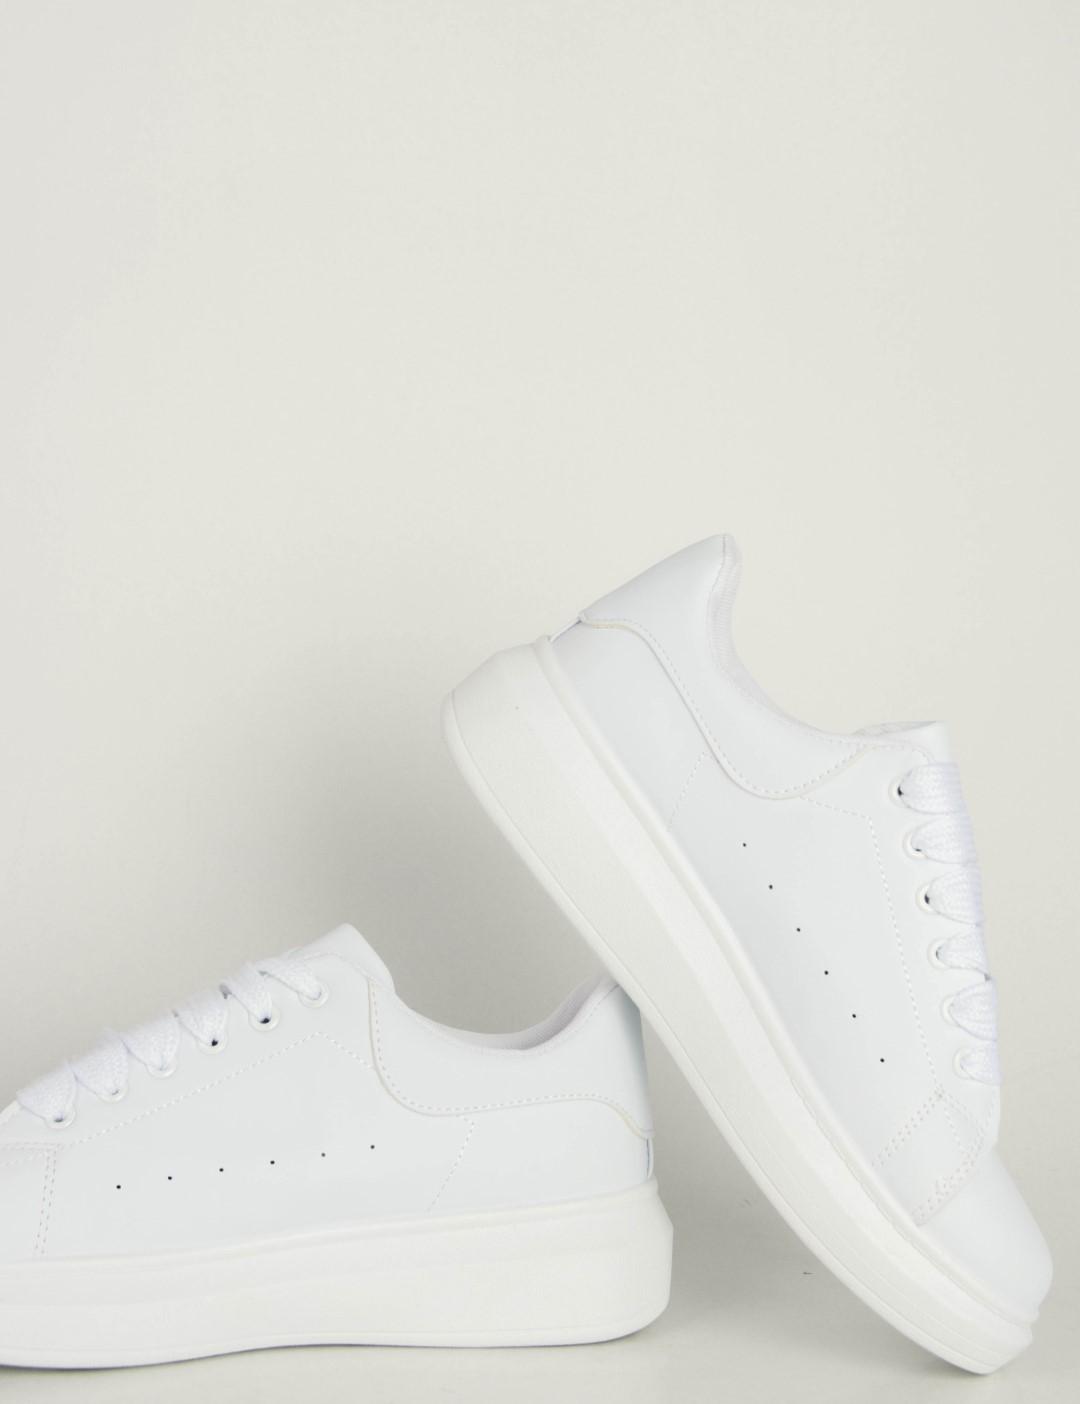 30ce78ab57f Ανδρικά λευκά δίσολα Sneakers λαστιχένια σόλα M723